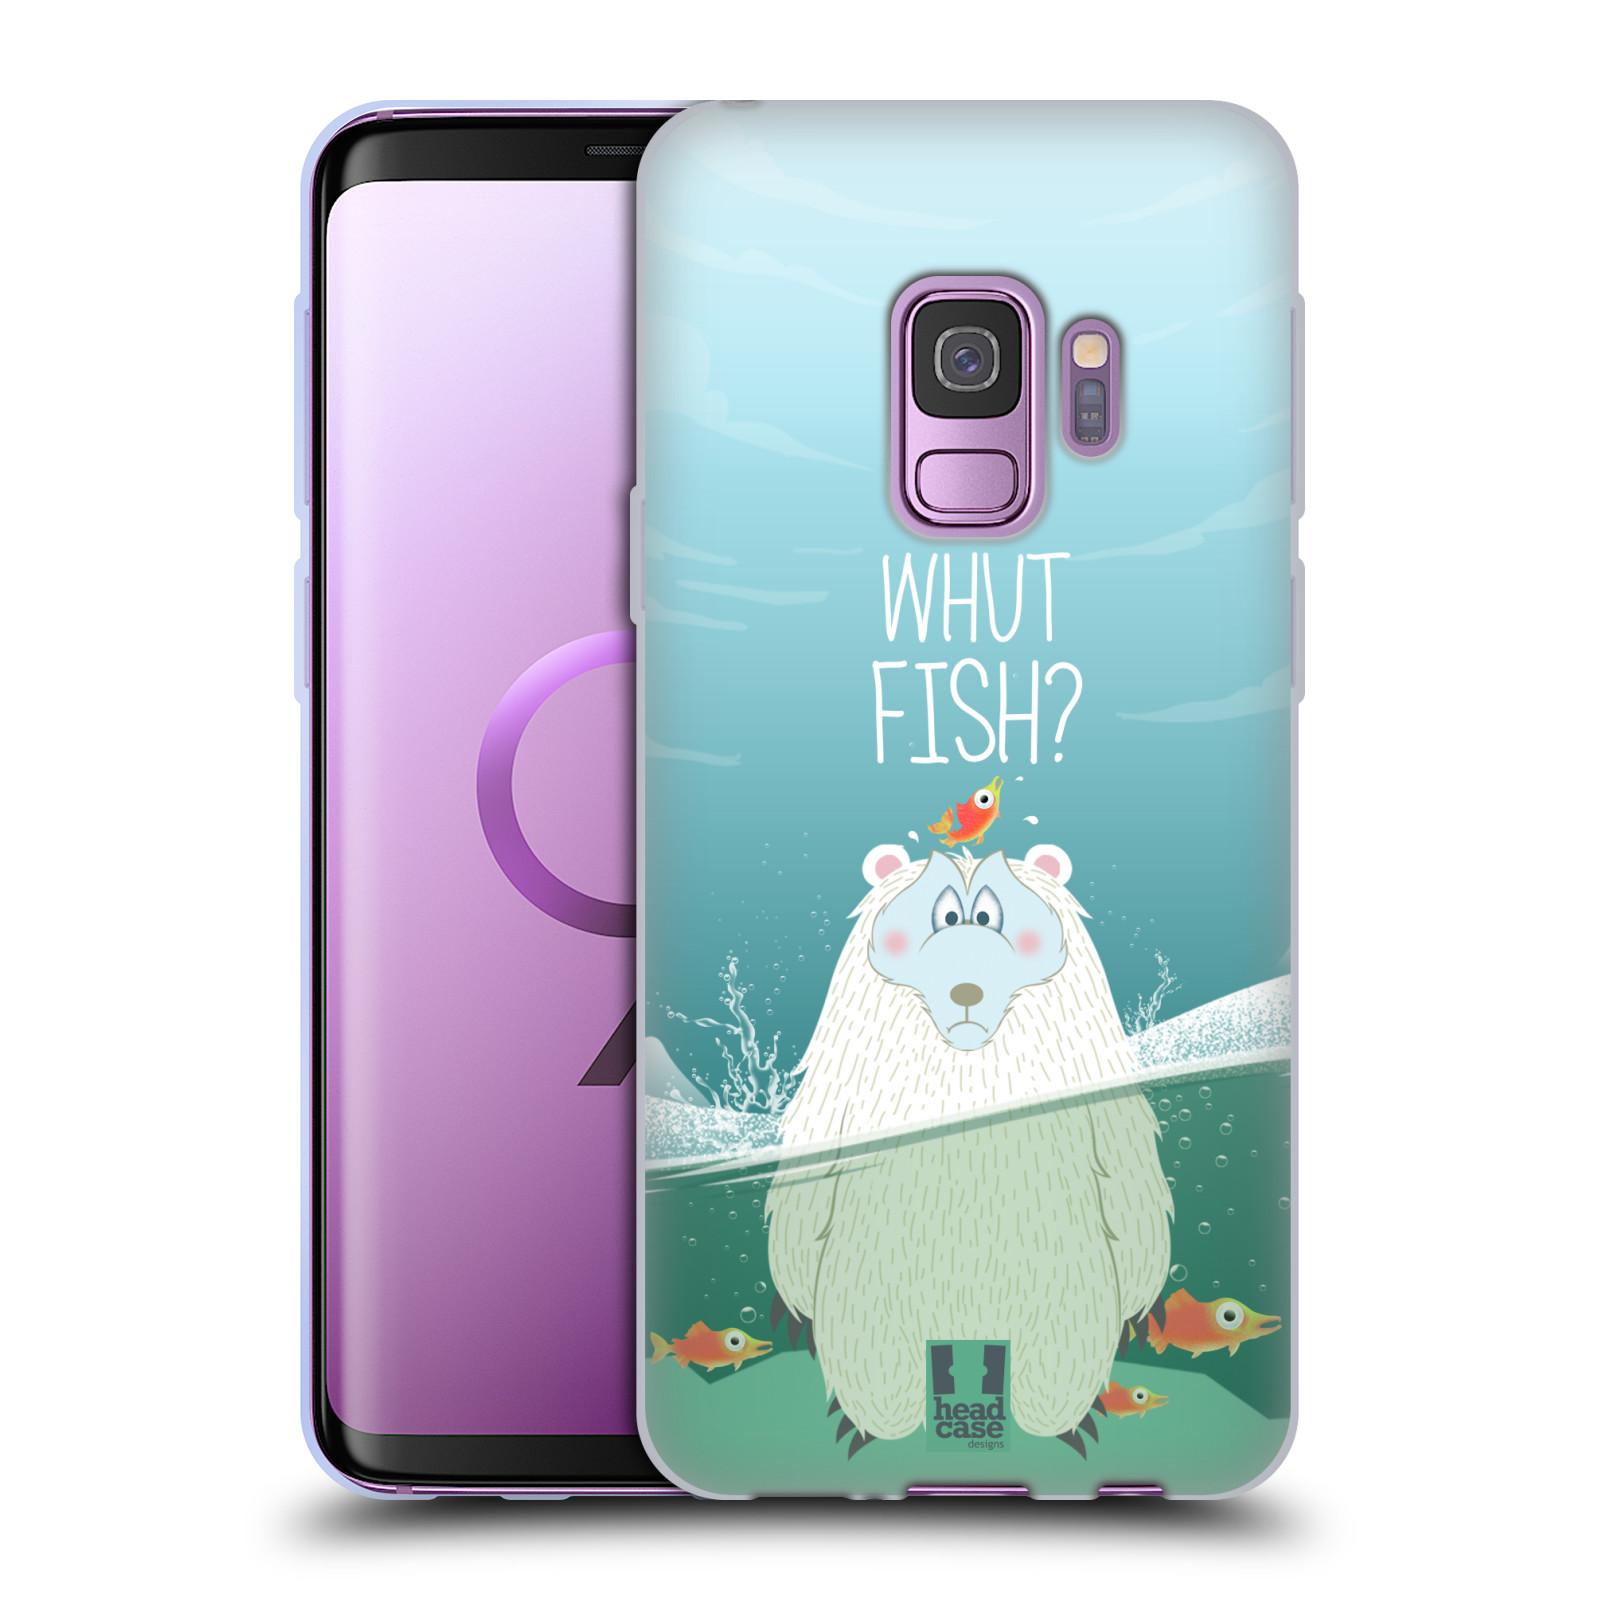 Silikonové pouzdro na mobil Samsung Galaxy S9 - Head Case - Medvěd Whut Fish?